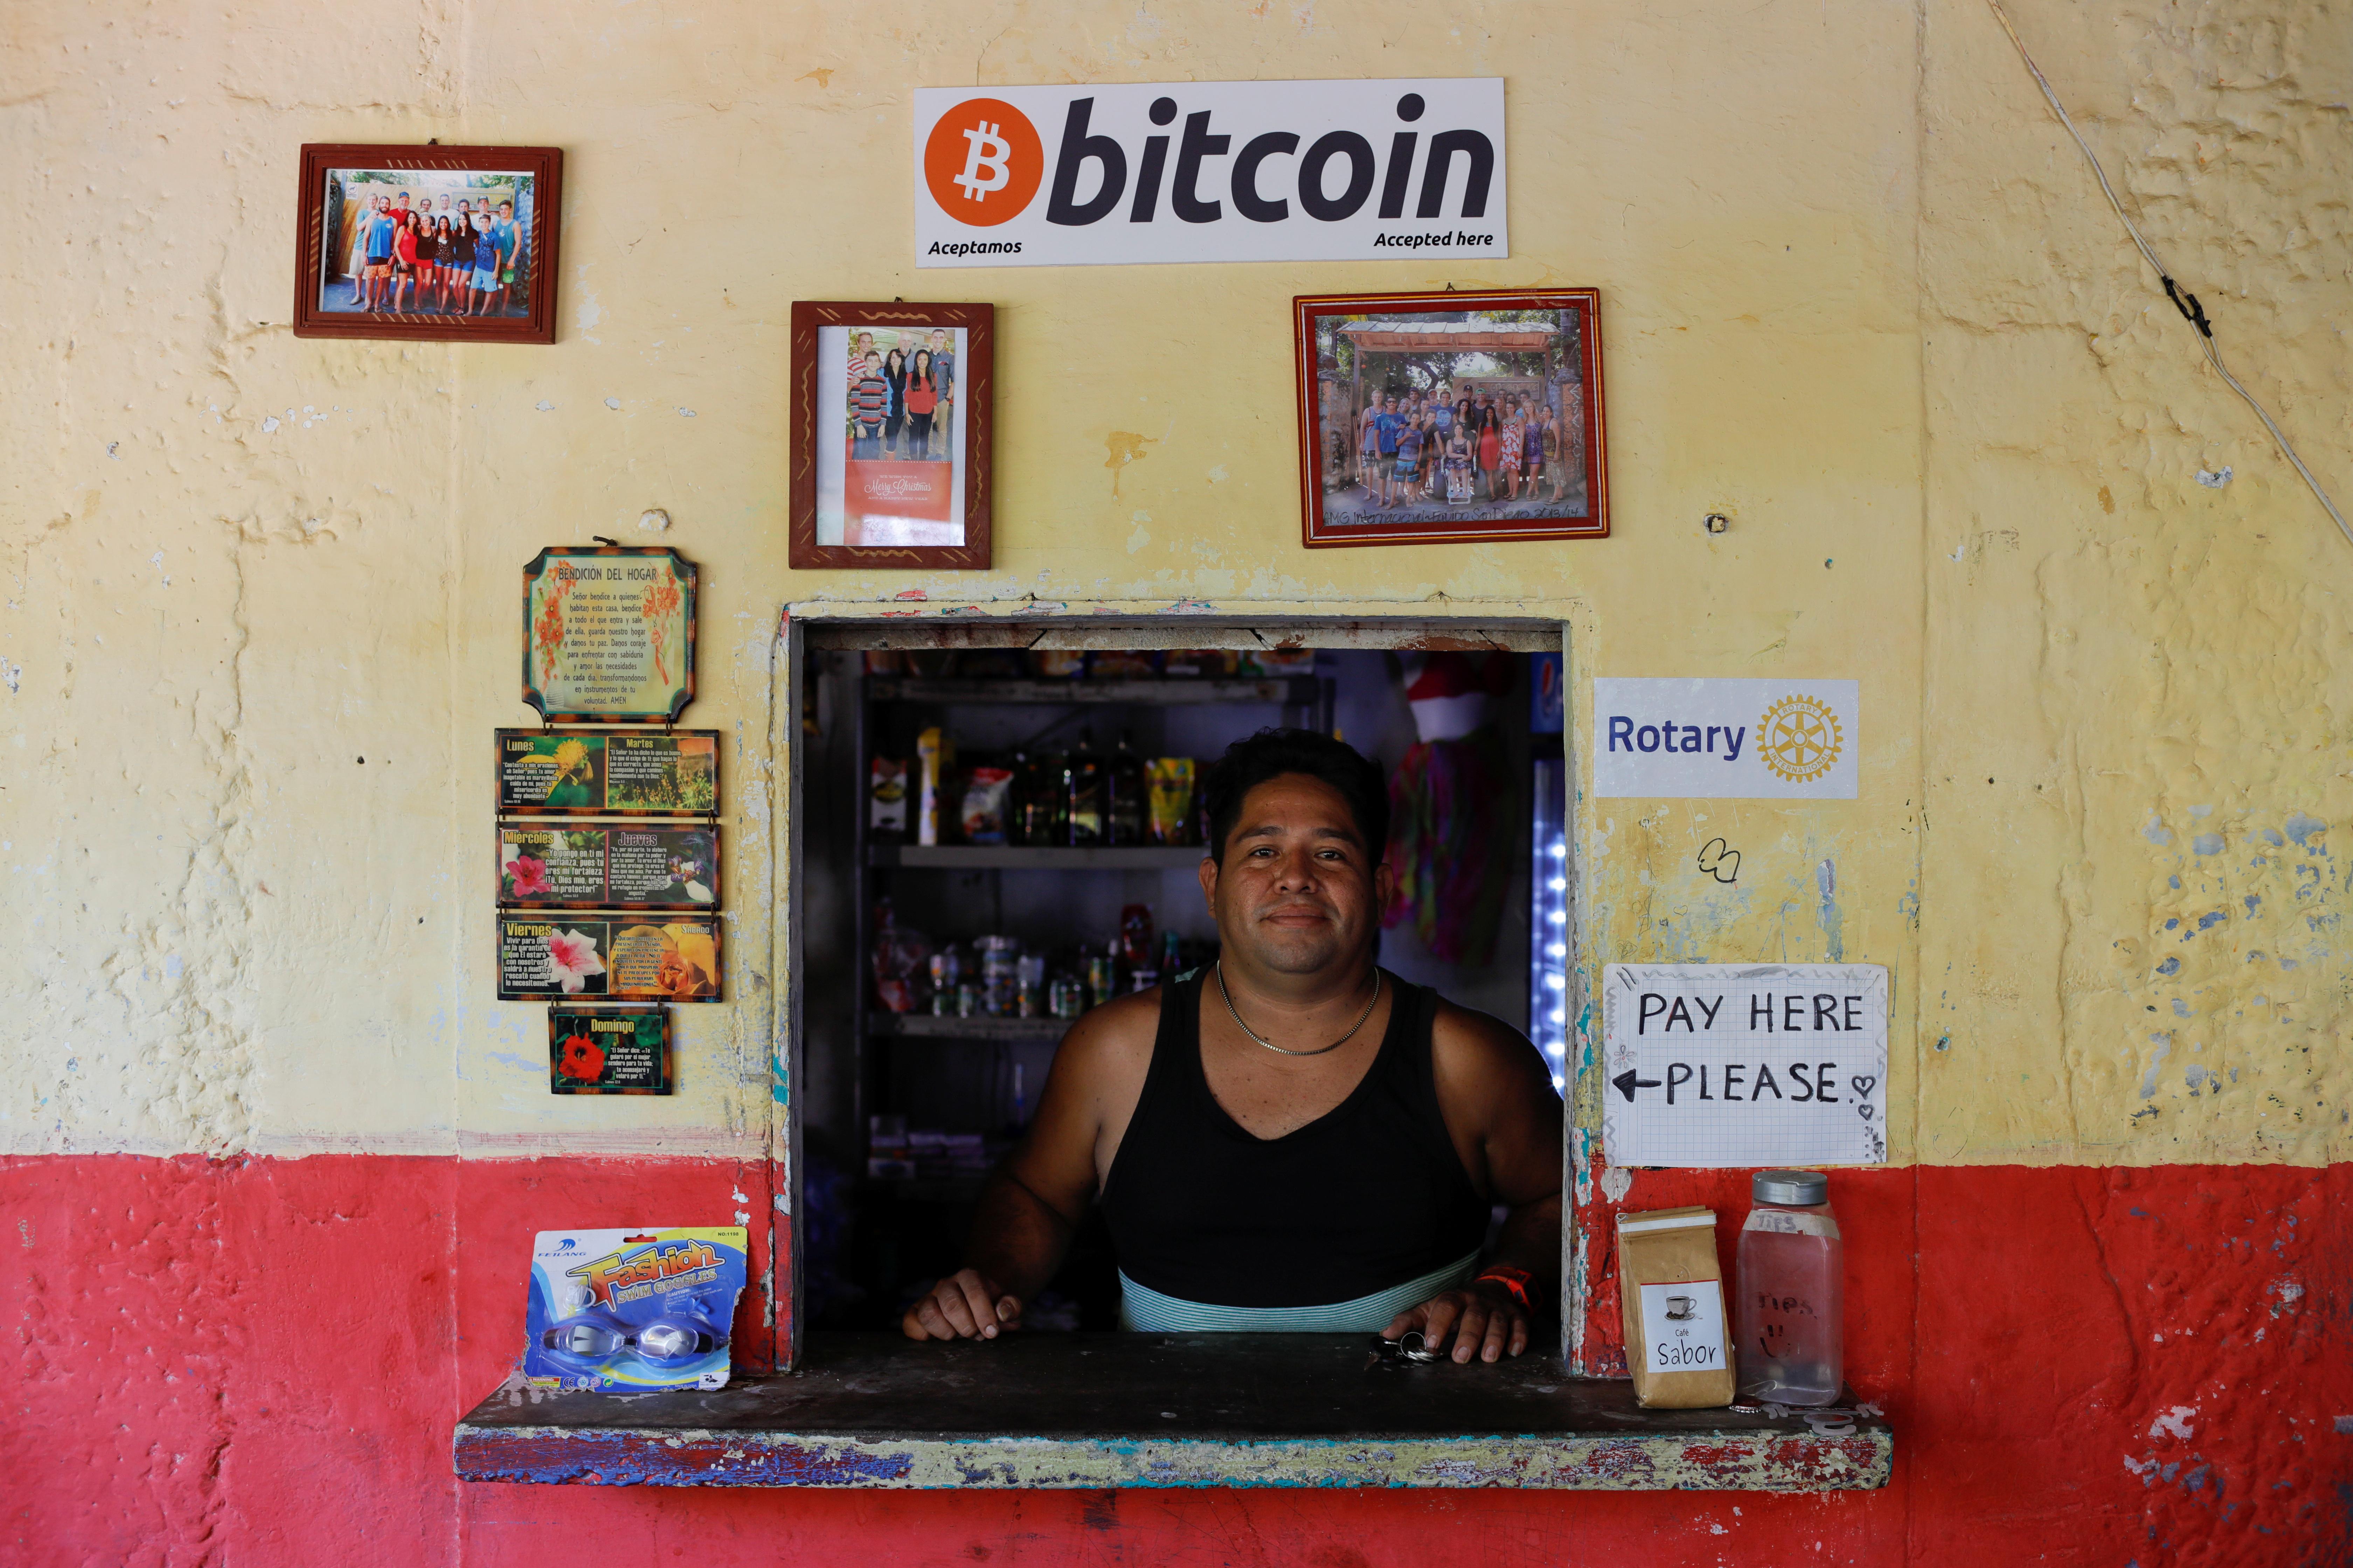 Roberto Carlos Silva, owner of La Zontena store, poses at his business where he accepts Bitcoins at El Zonte Beach in Chiltiupan, El Salvador June 8, 2021. REUTERS/Jose Cabezas